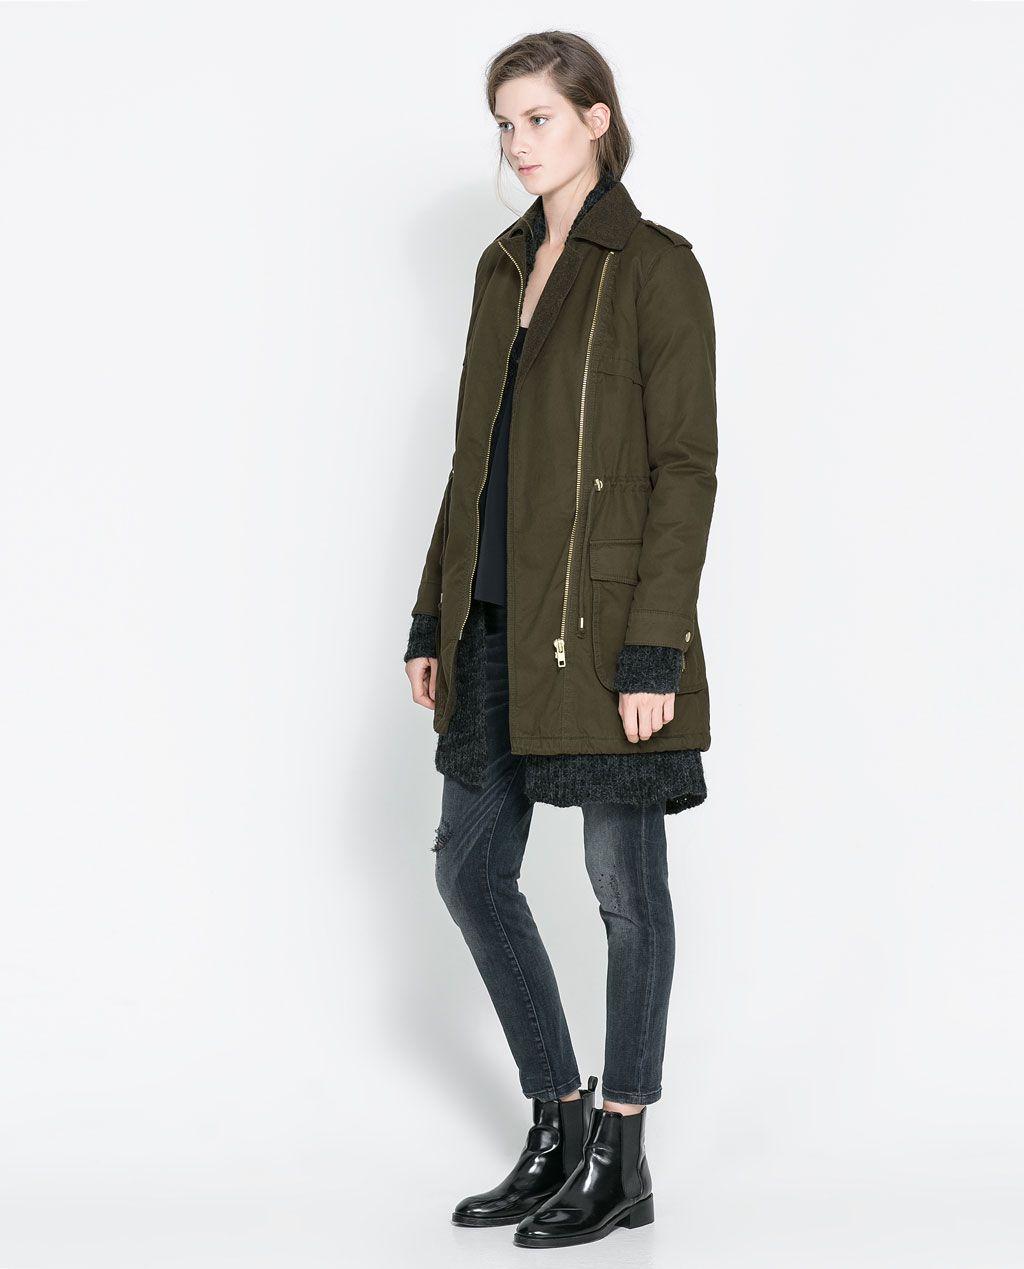 COTTON CROSSOVER PARKA from Zara